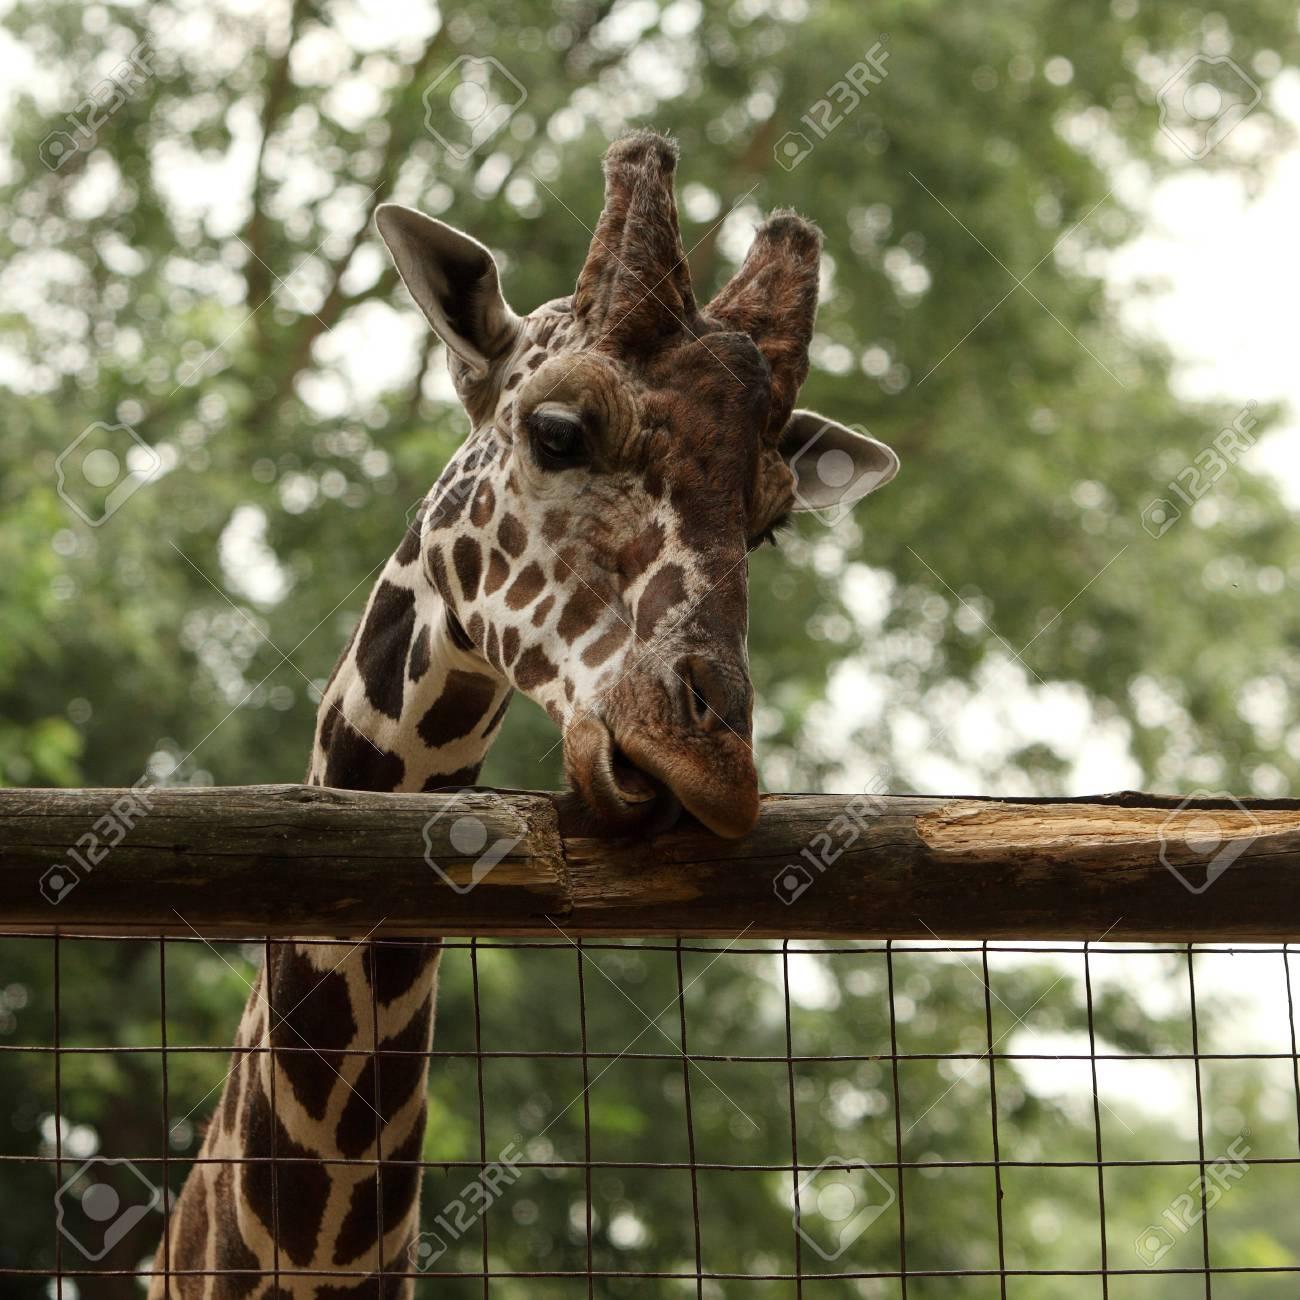 Giraffe portrait in the zoo Stock Photo - 10319978